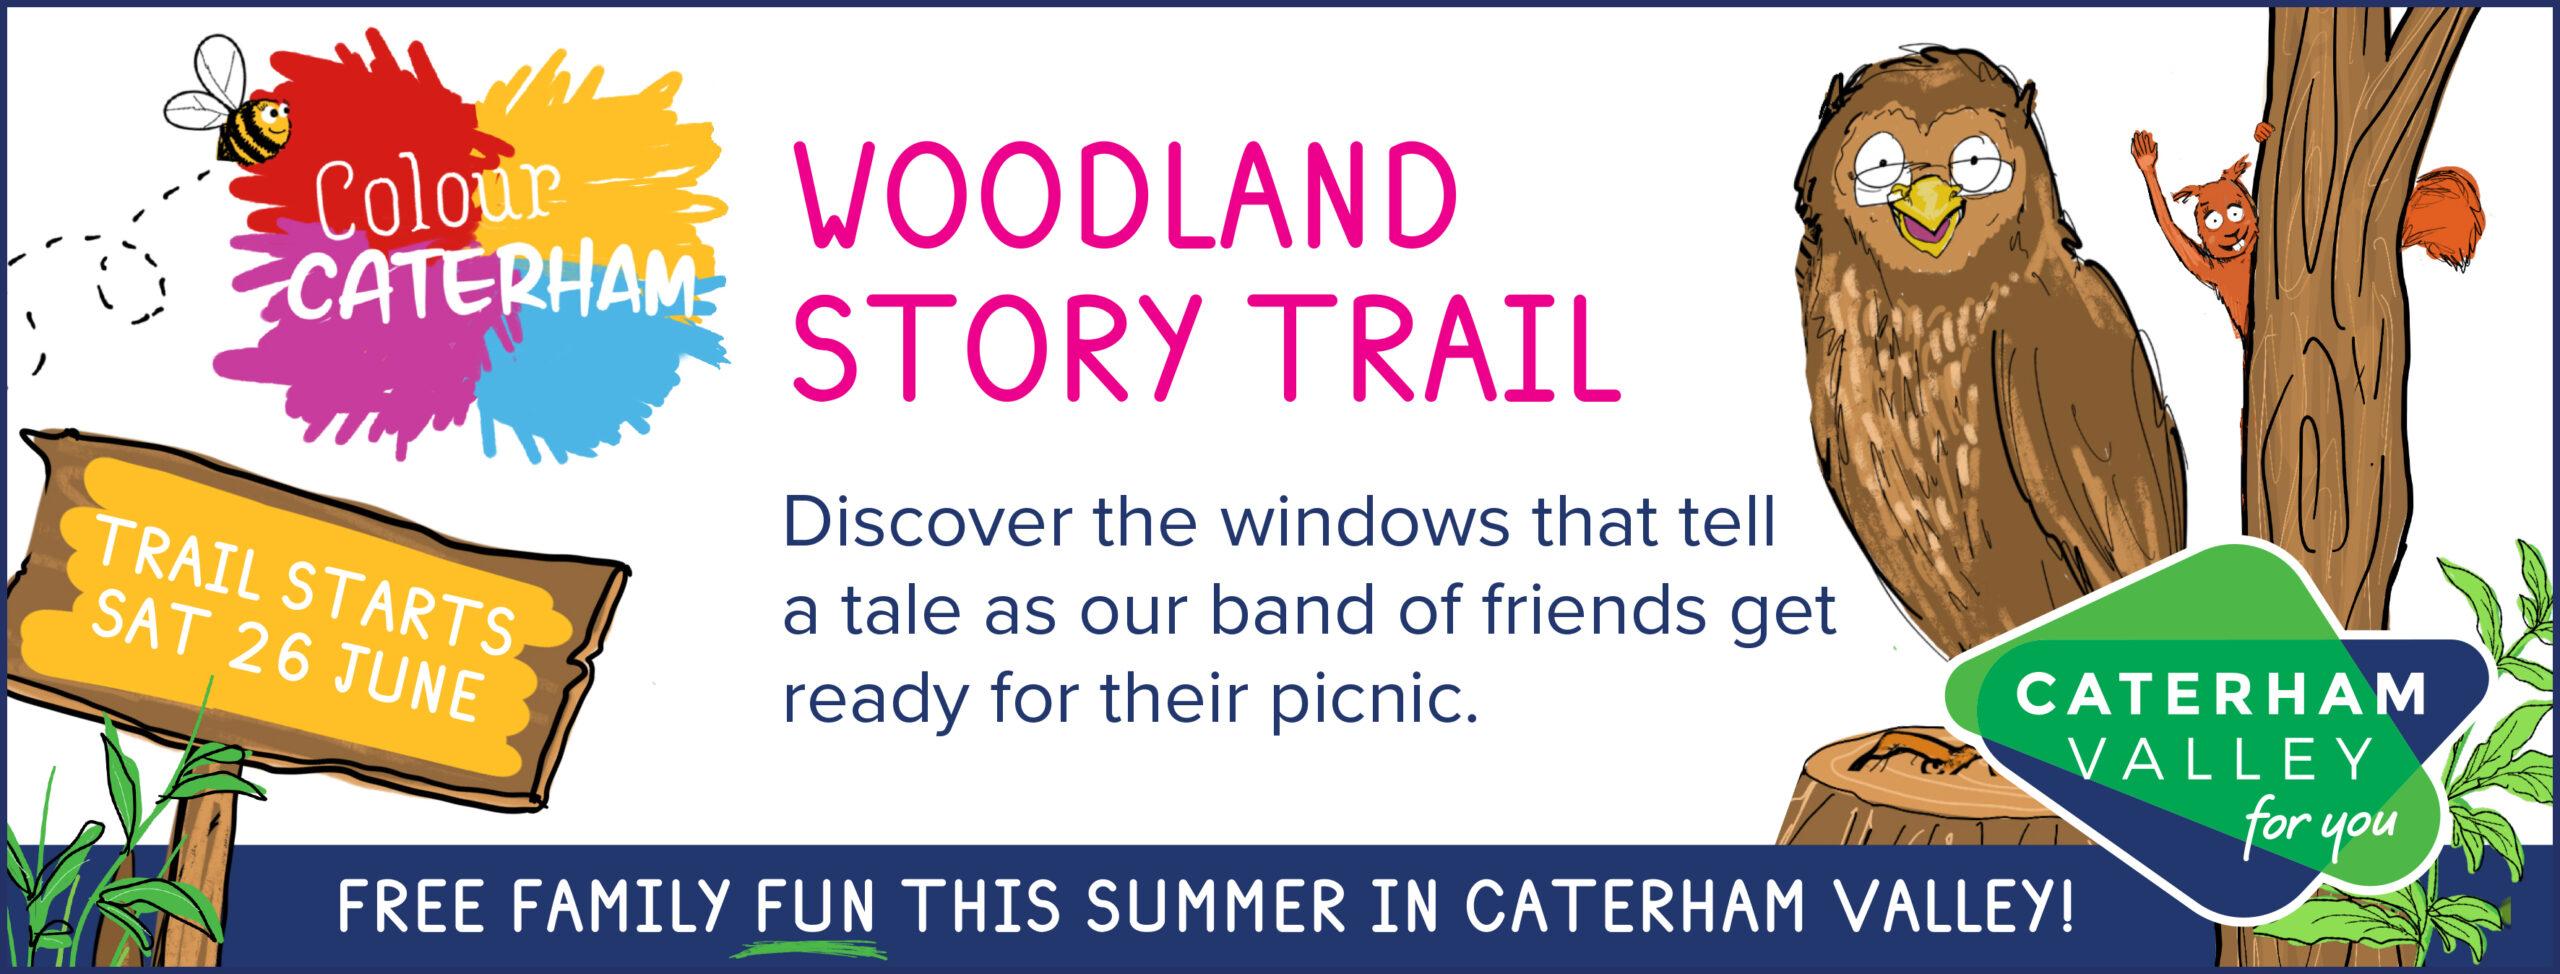 Colour Caterham, Surrey, event trail 2021